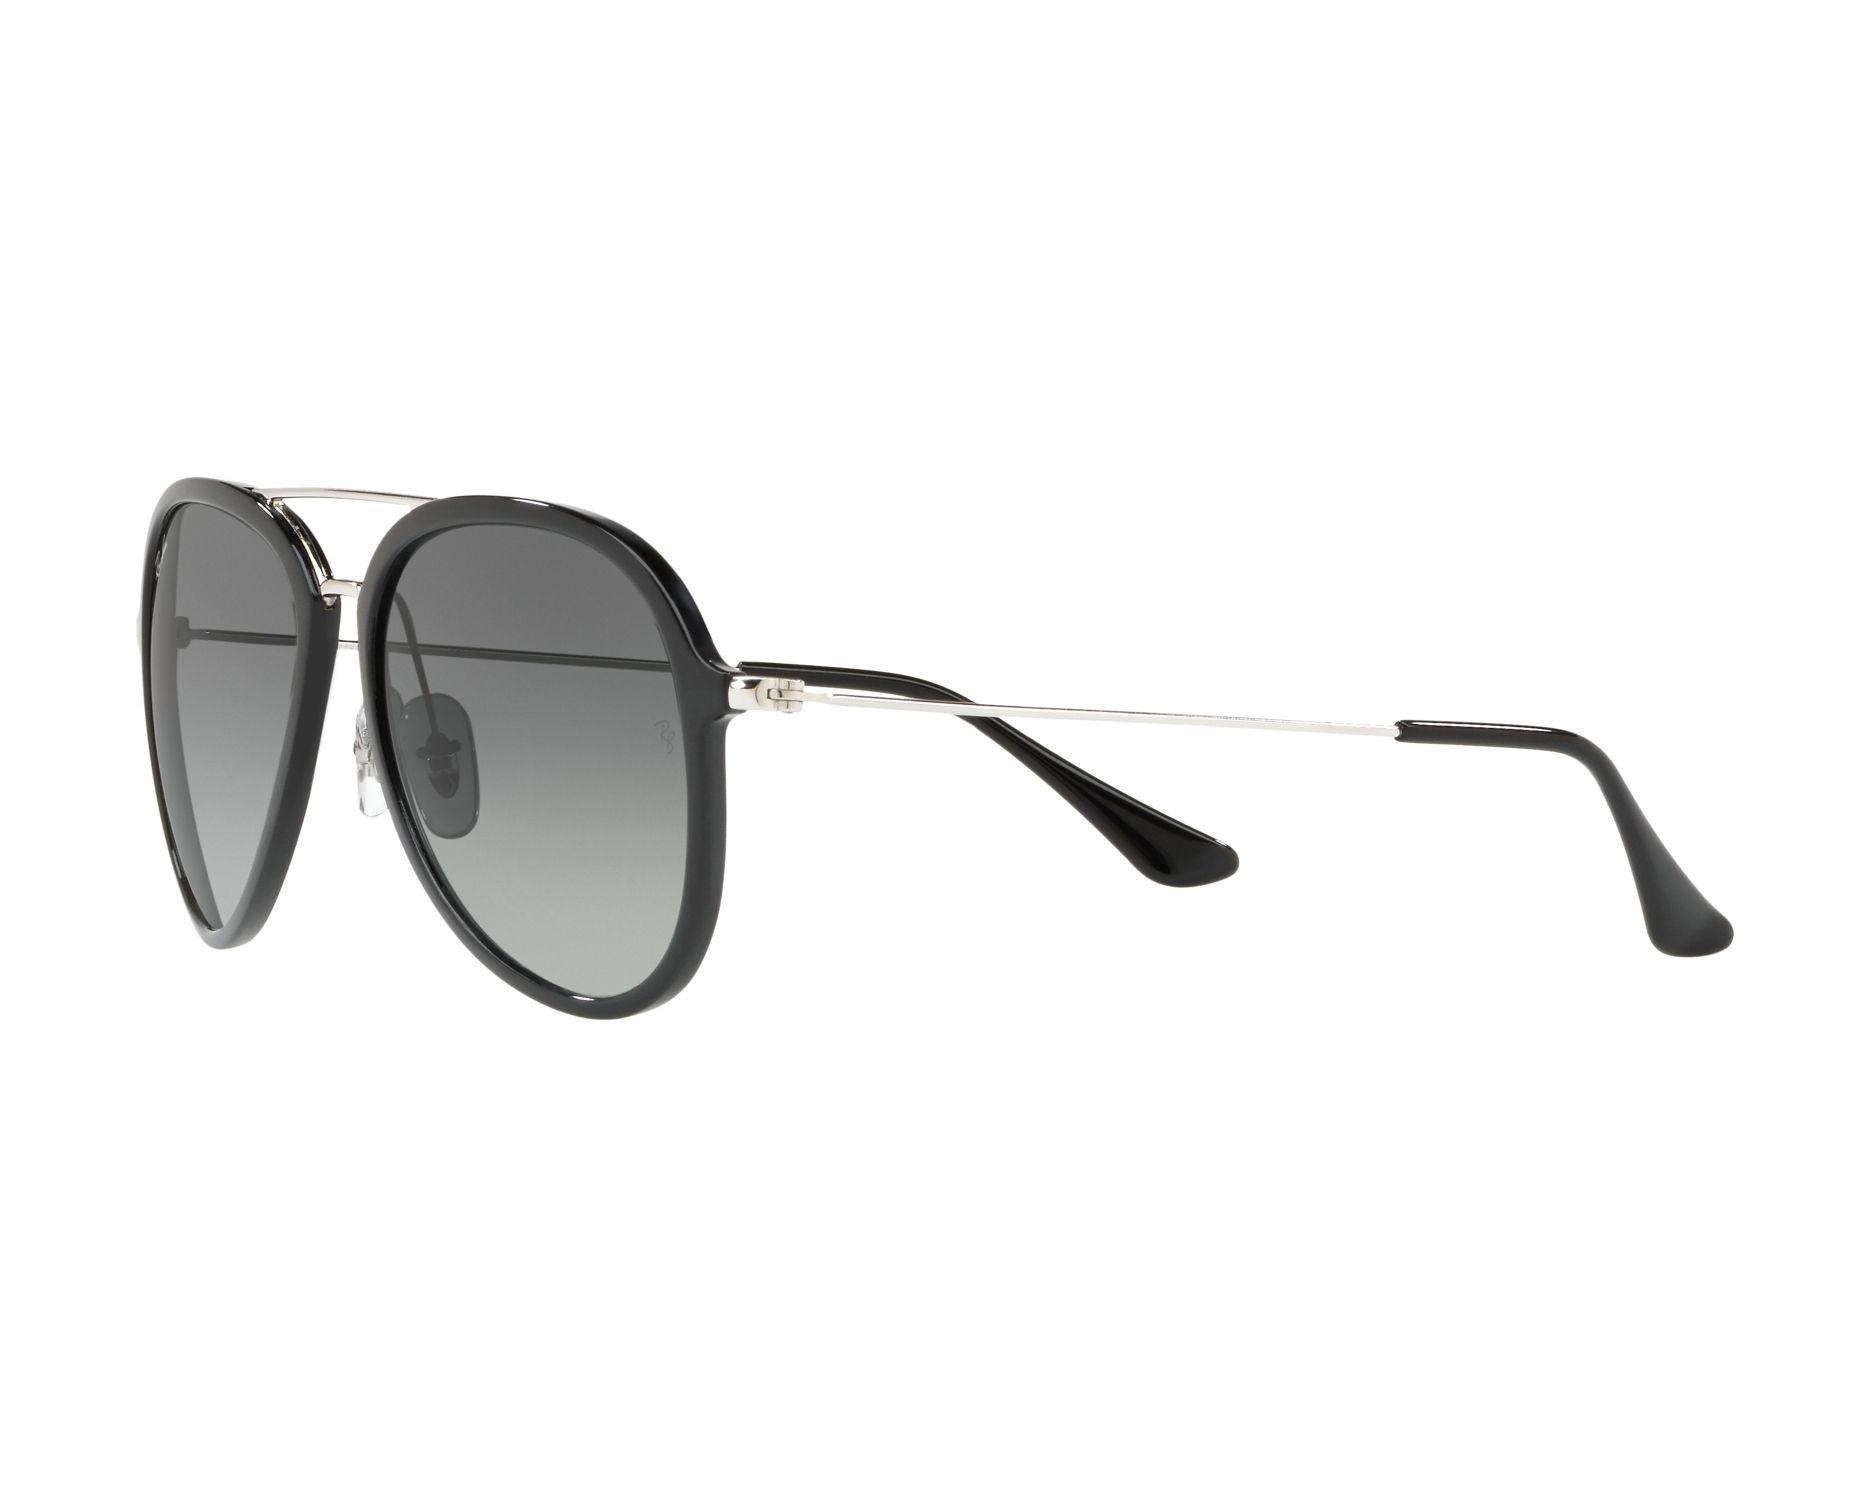 Sunglasses Ray-Ban RB-4298 601 71 57-17 Black Silver 360 2a4017ab32